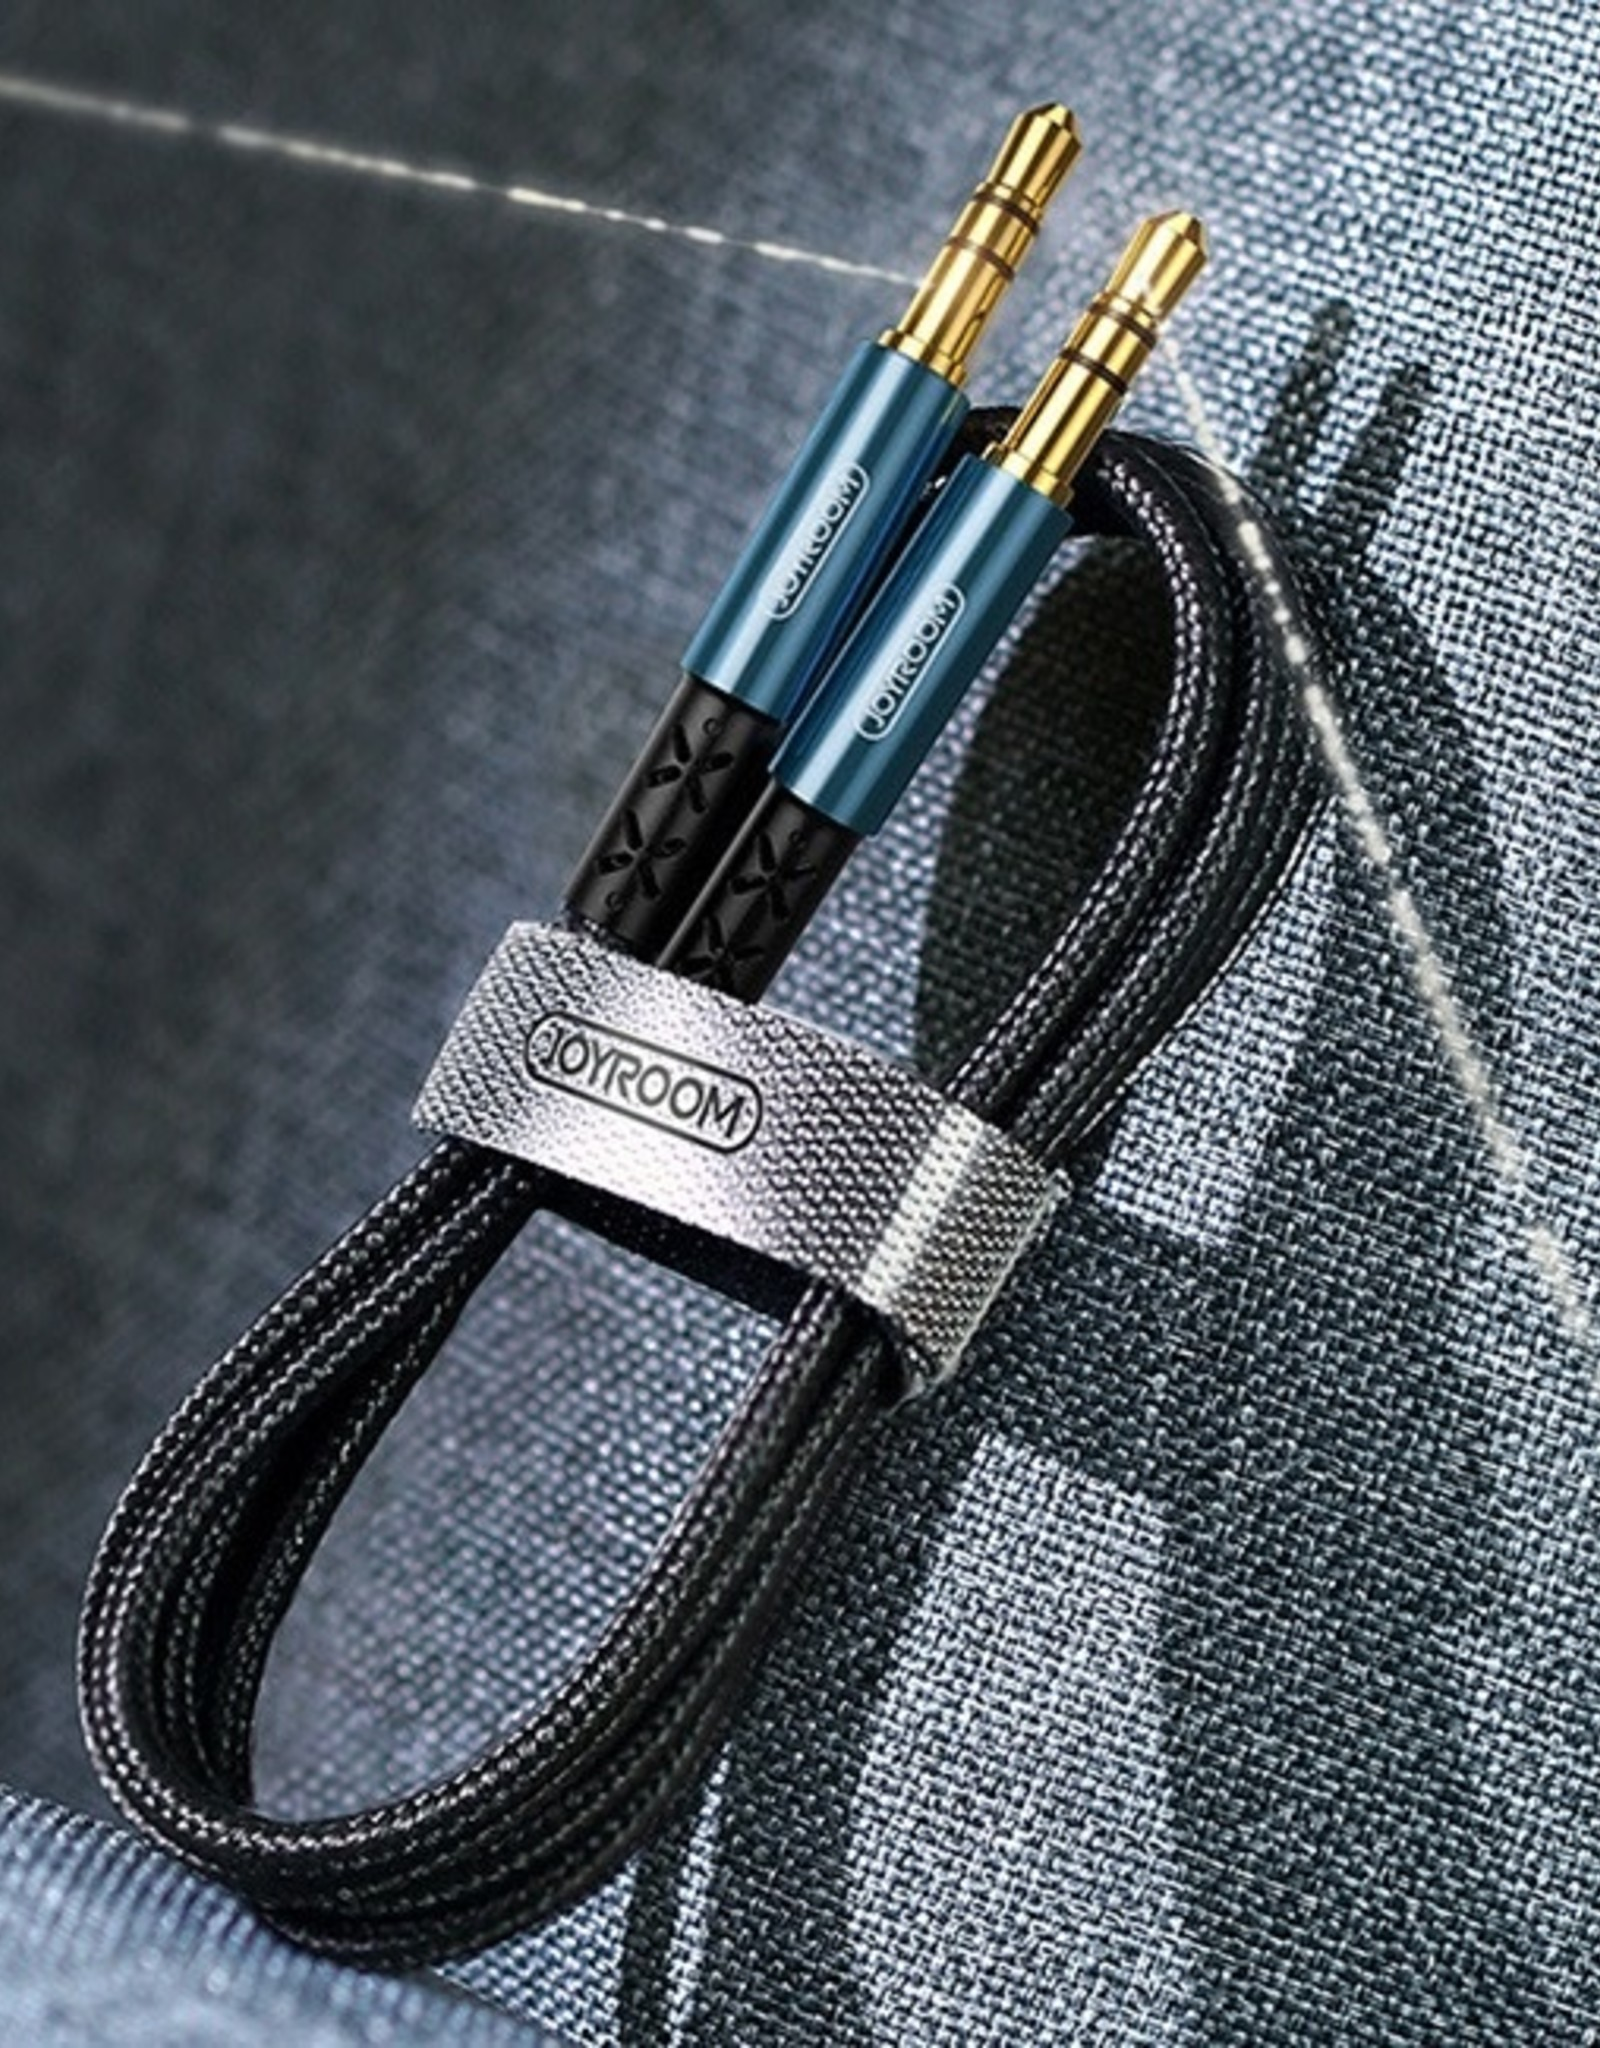 Joyroom Joyroom A1 Series Audio AUX Cable 1m